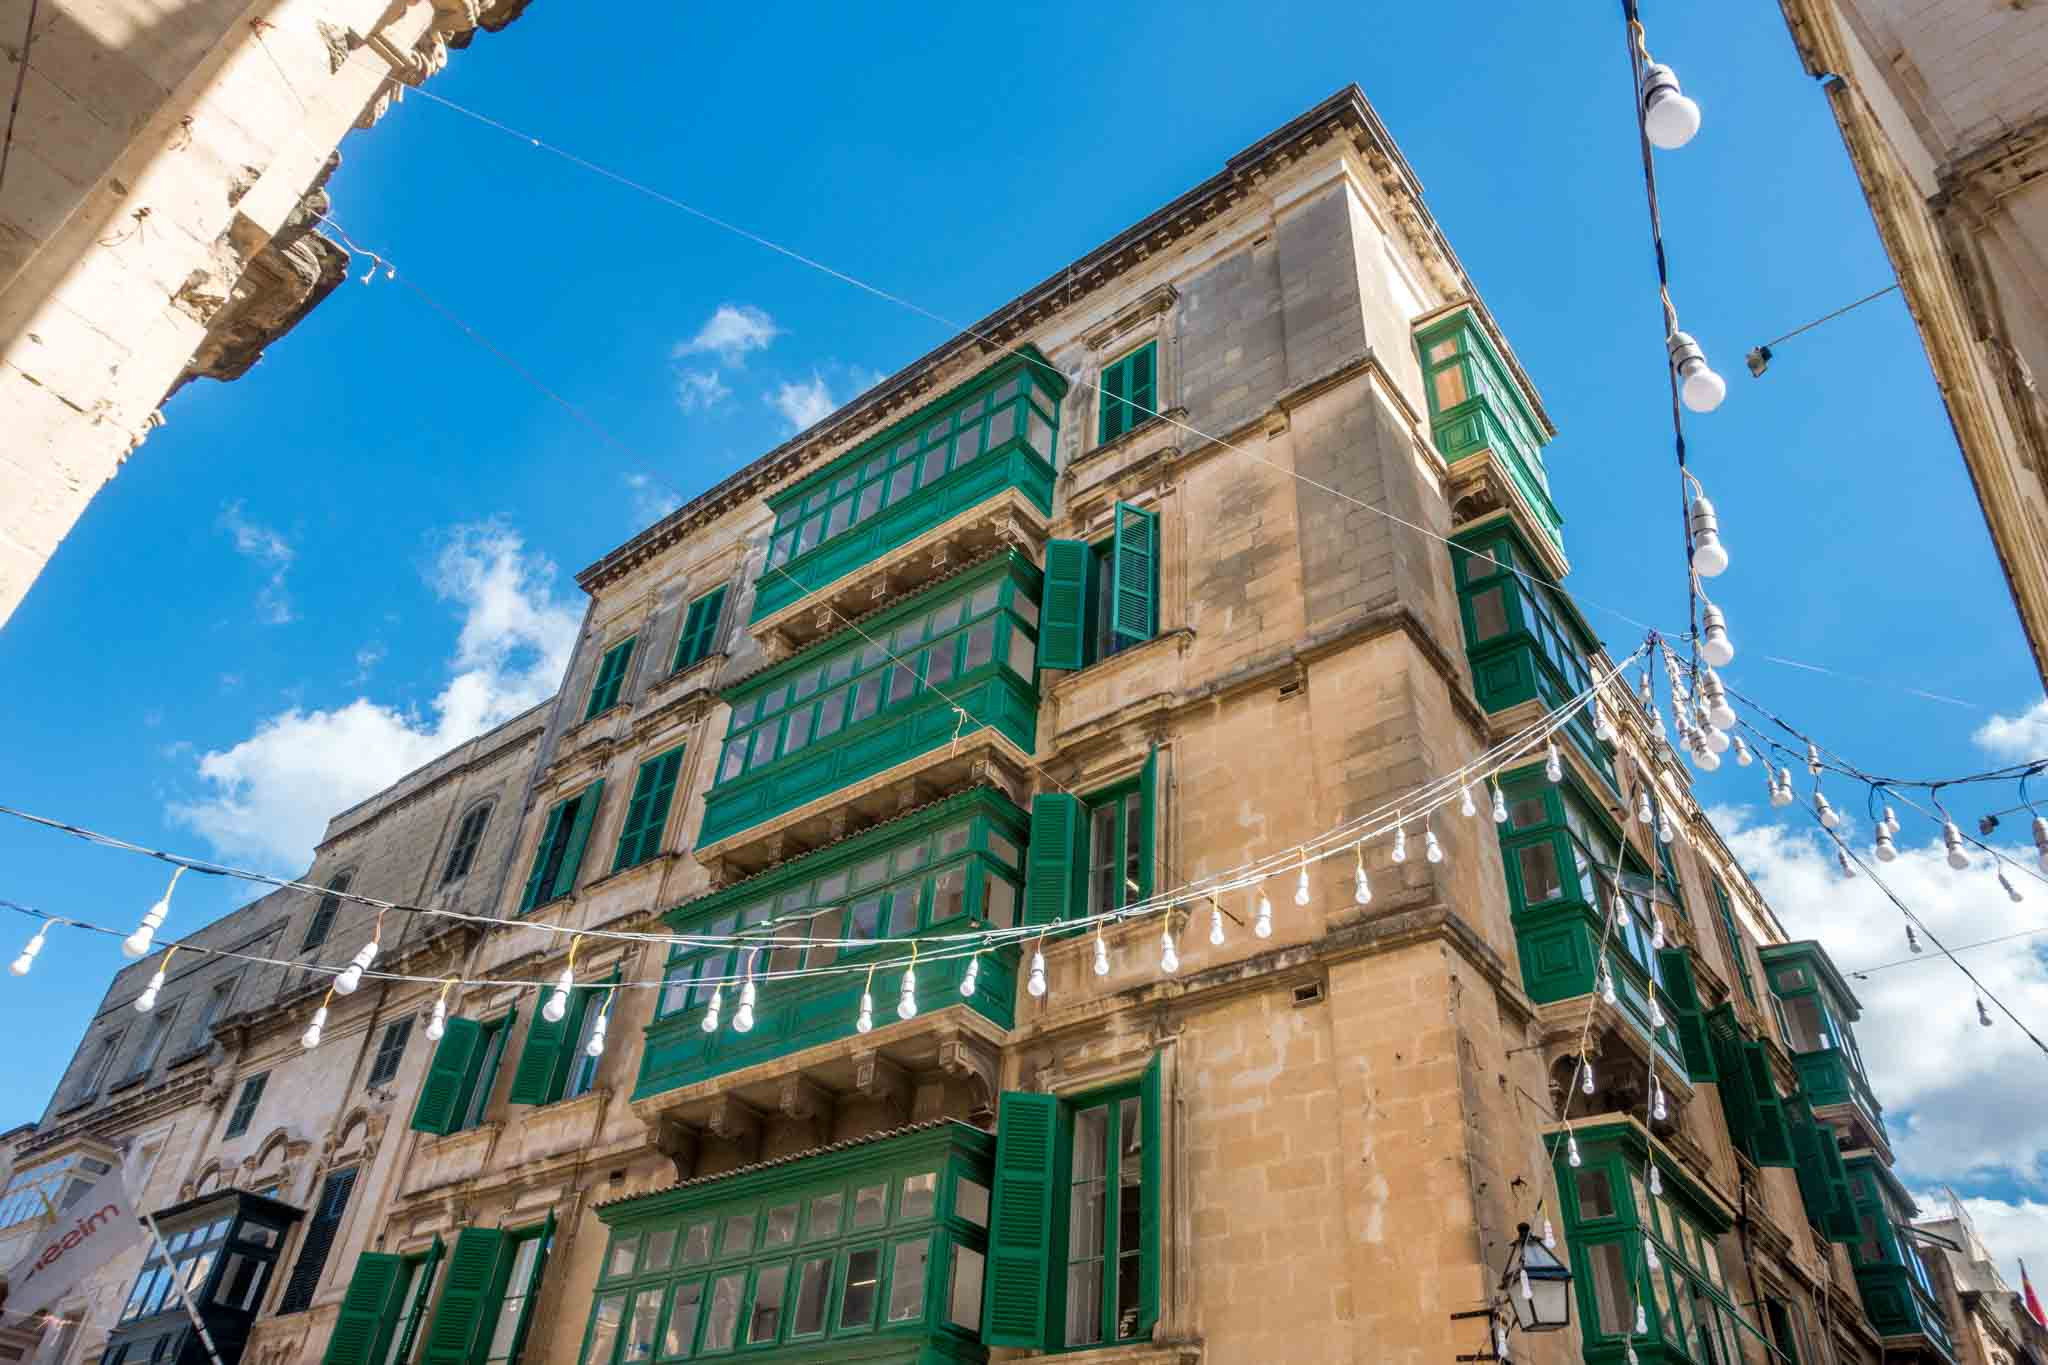 Colorful balconies on Malta island